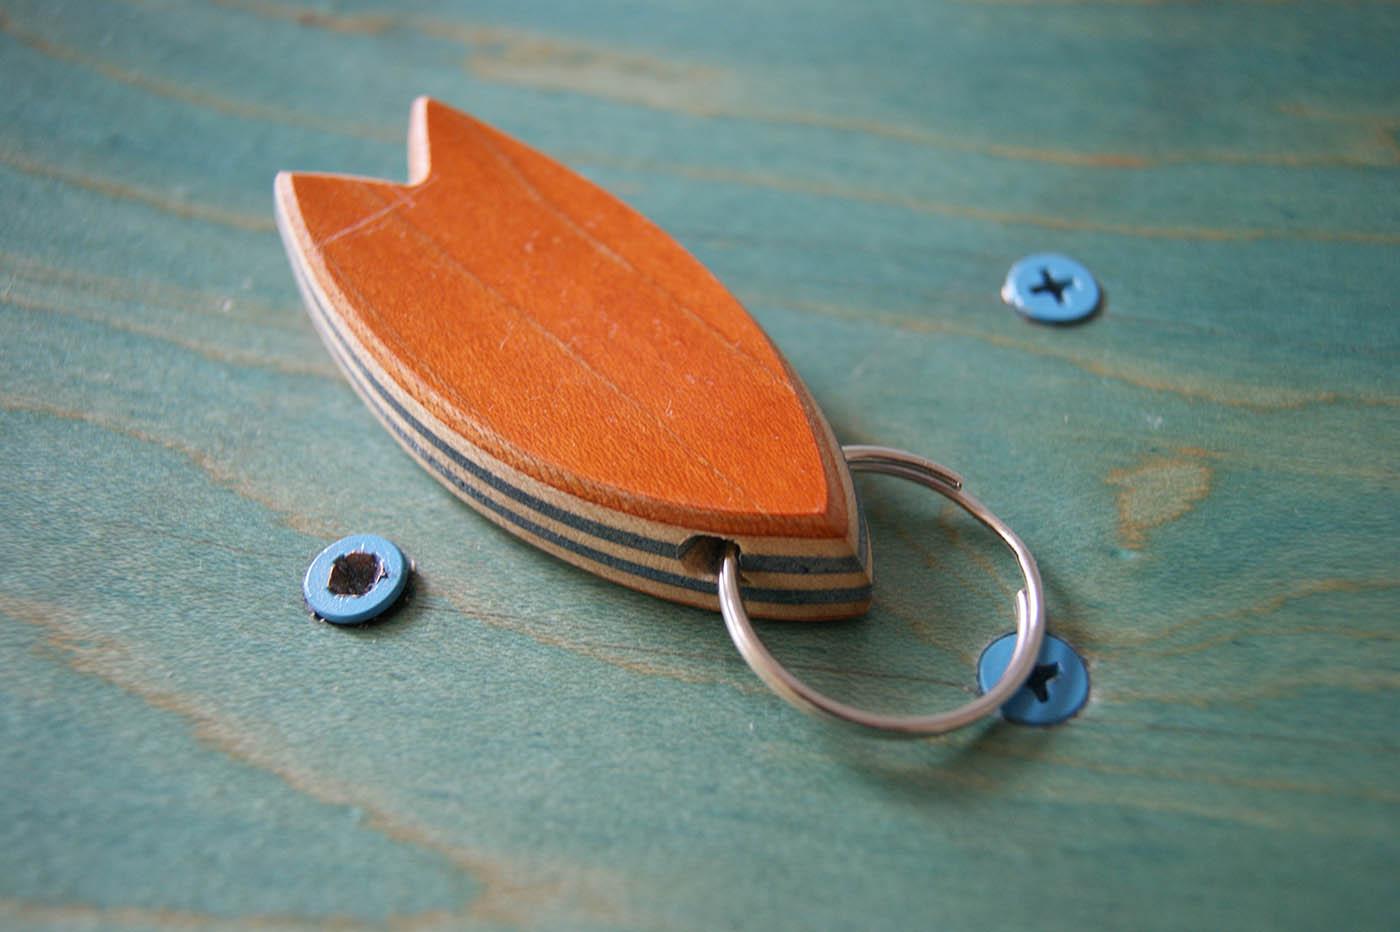 6-Skatan-LLC-Surfboard-Key-Chain-Skateboarding-Upcycling (25)